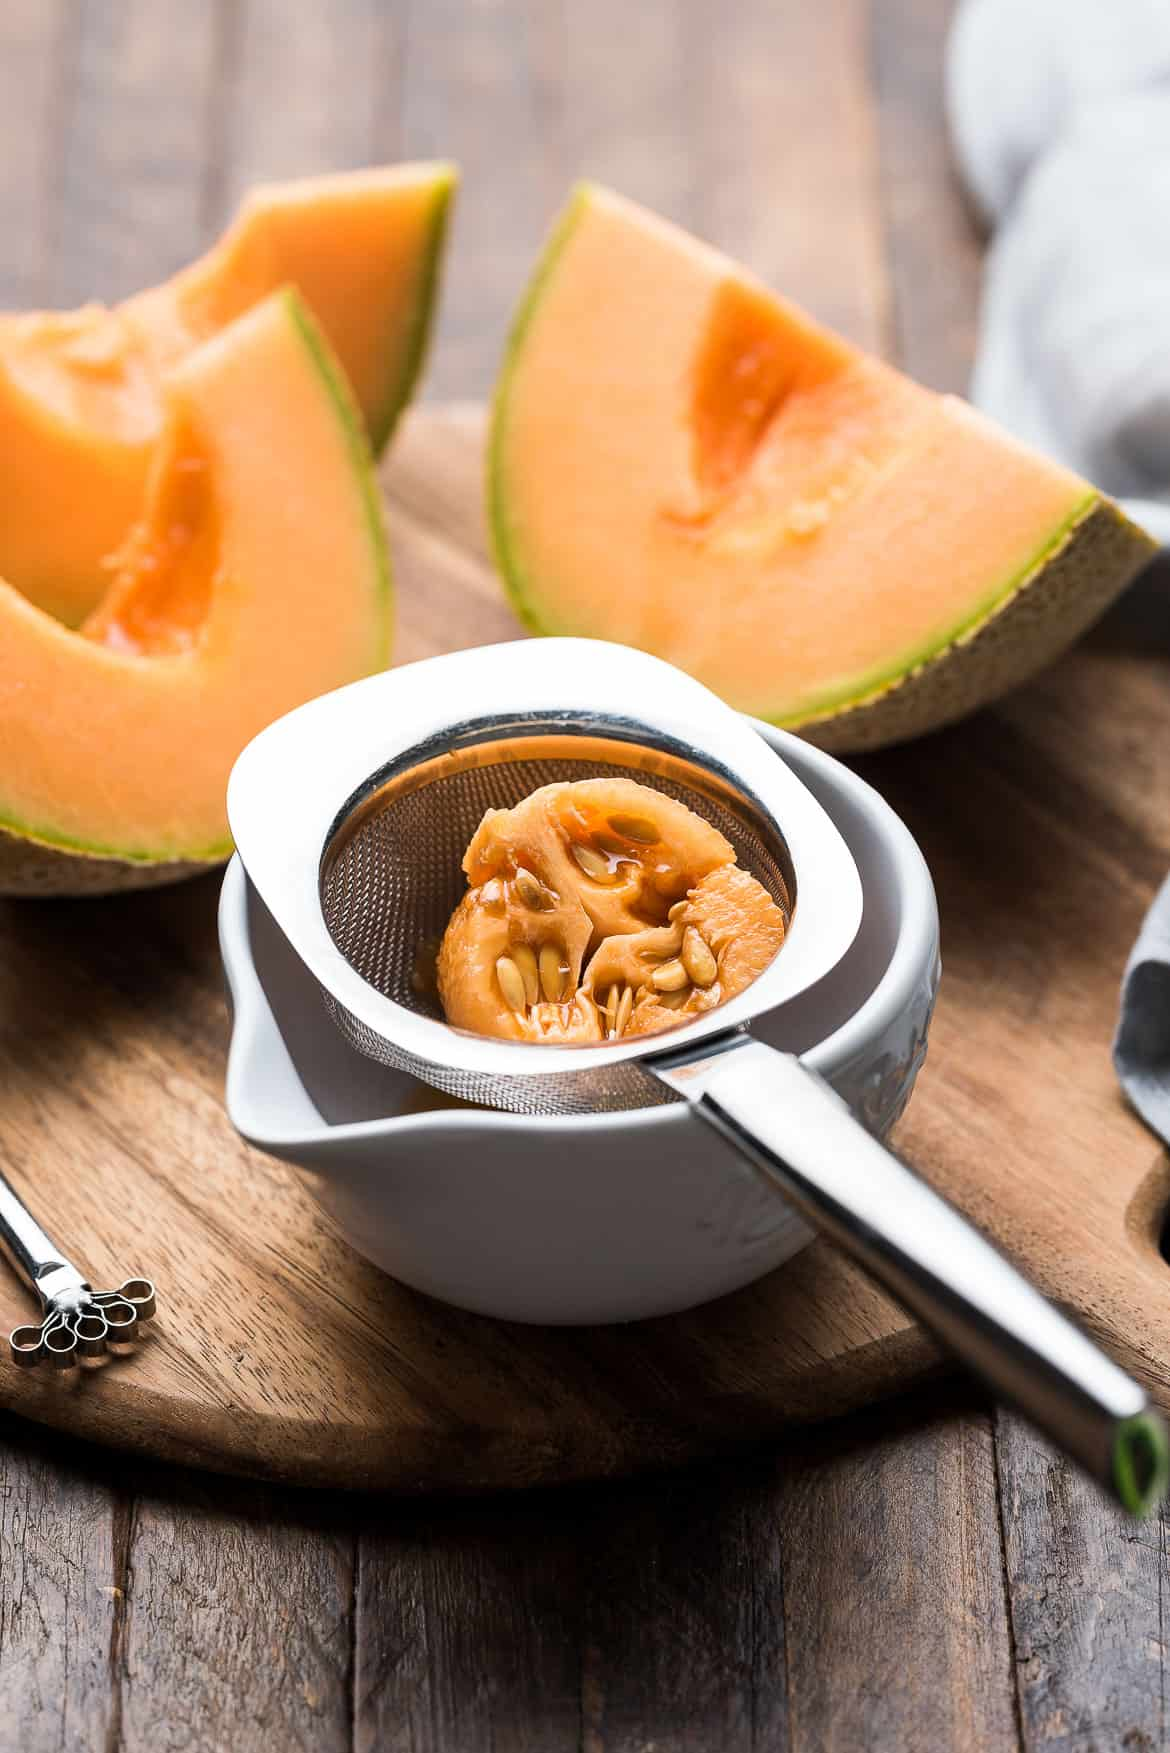 Straining seeds and pulp for Cantaloupe Juice (melon sa malamig)